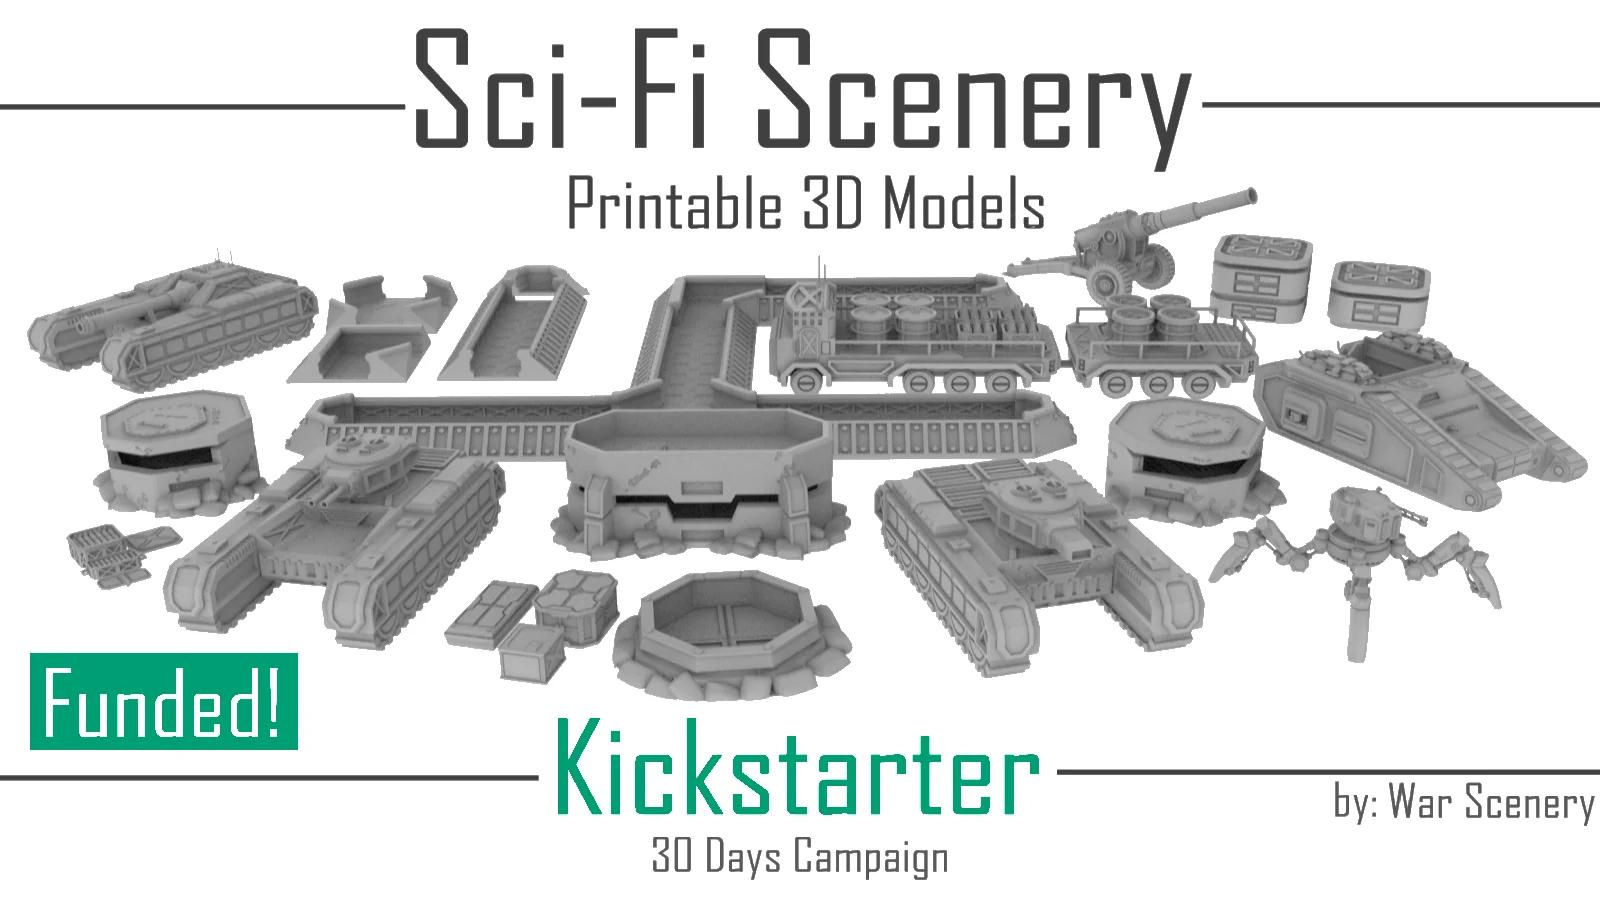 Sci-Fi Scenery Kickstarter War Scenery